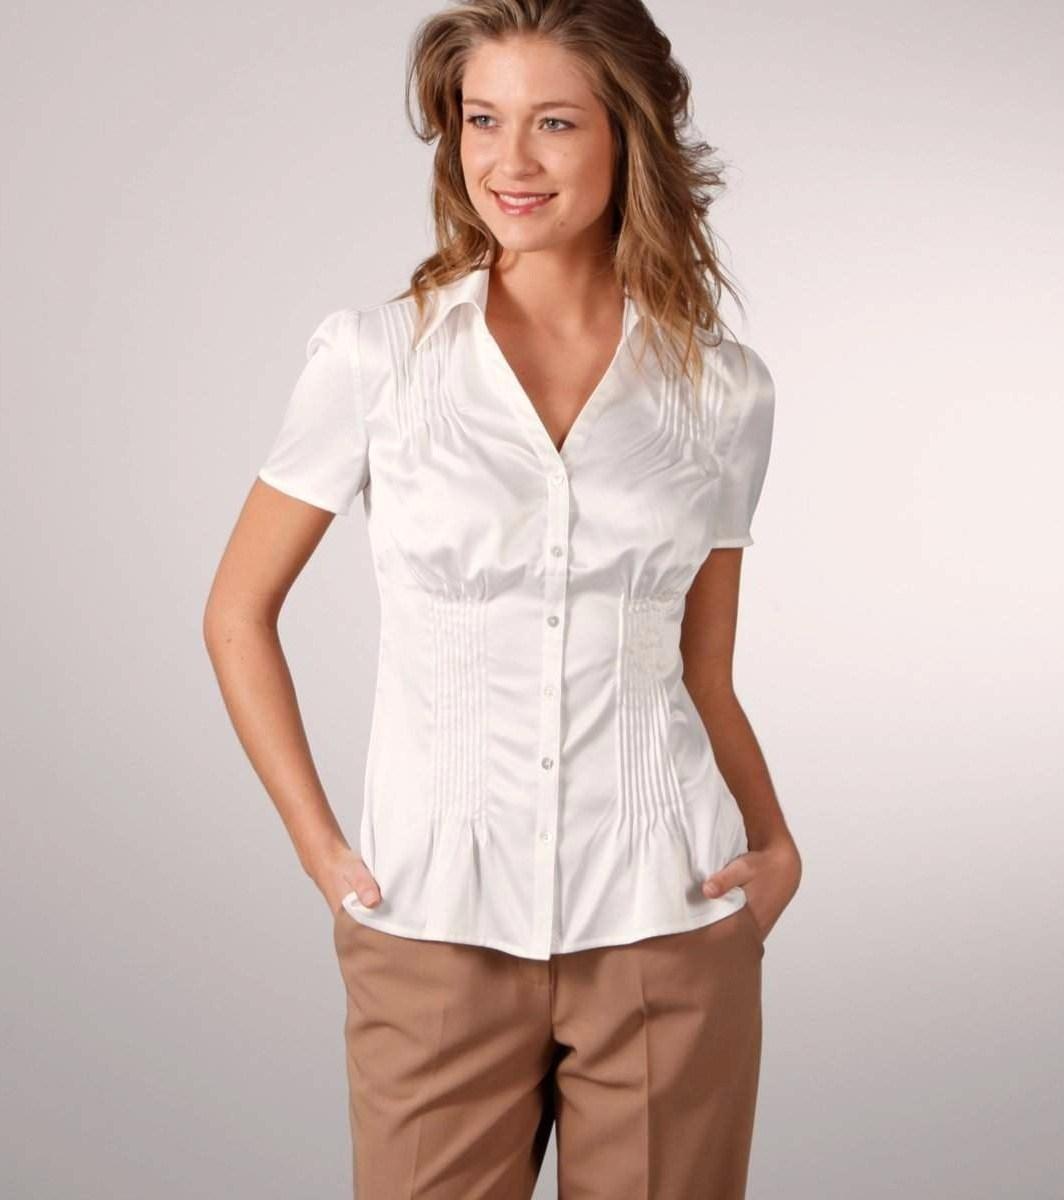 Короткая Блузка Фото